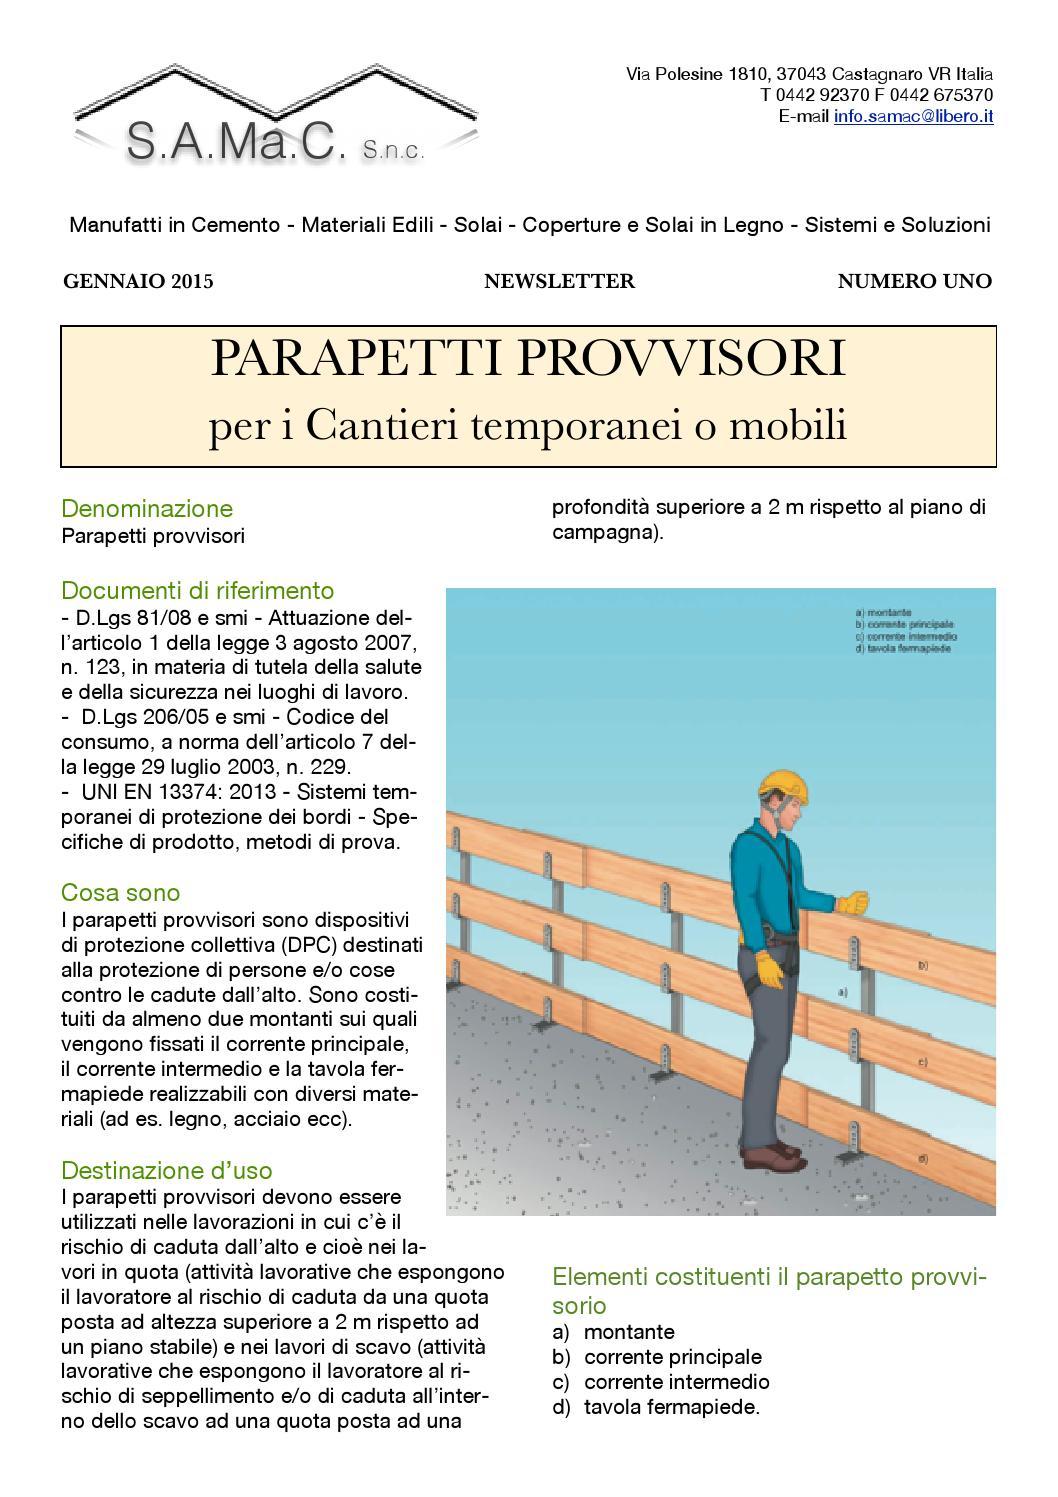 Altezza Dei Parapetti 1 newsletter gennaio 2015 by claudio campion - issuu